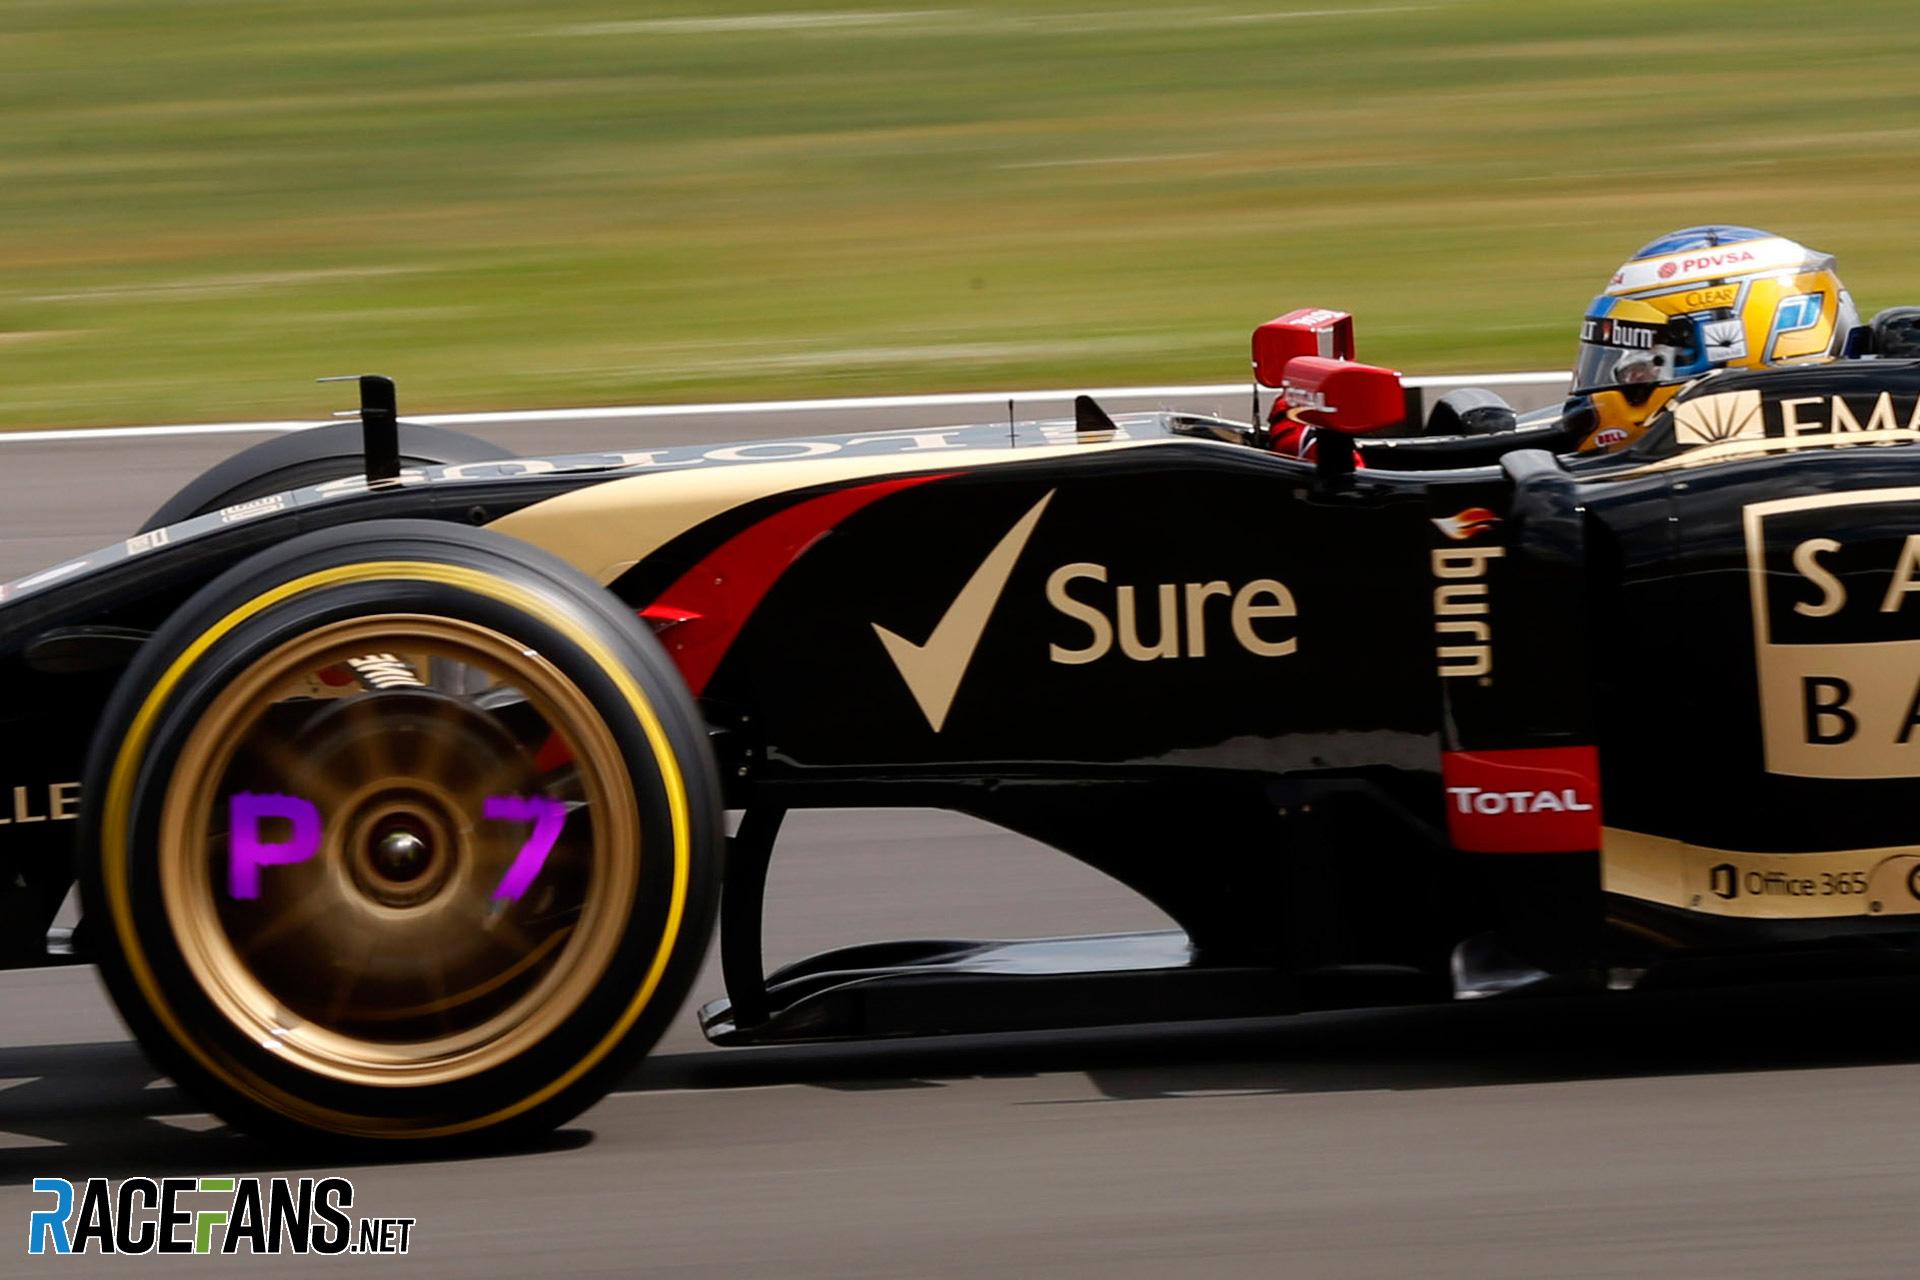 RaceFans image: How 2021 F1 wheel rim lights could look